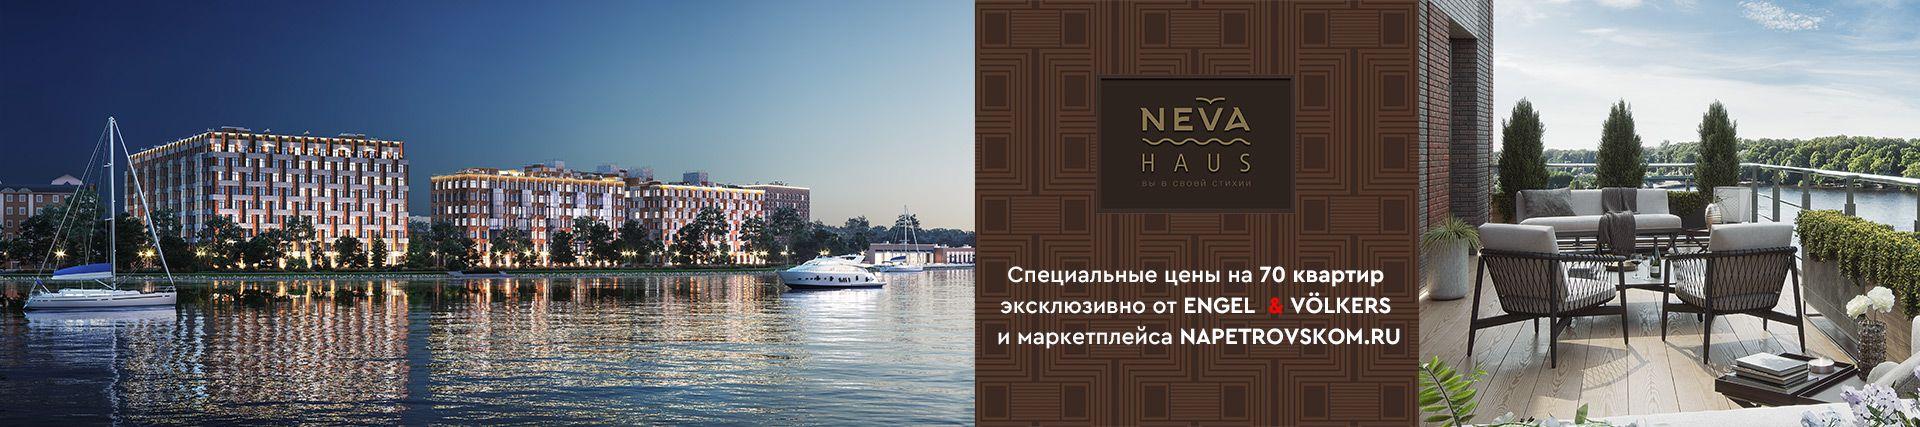 https://evspb.ru/wp-content/uploads/2021/01/neva-house-b2.jpg